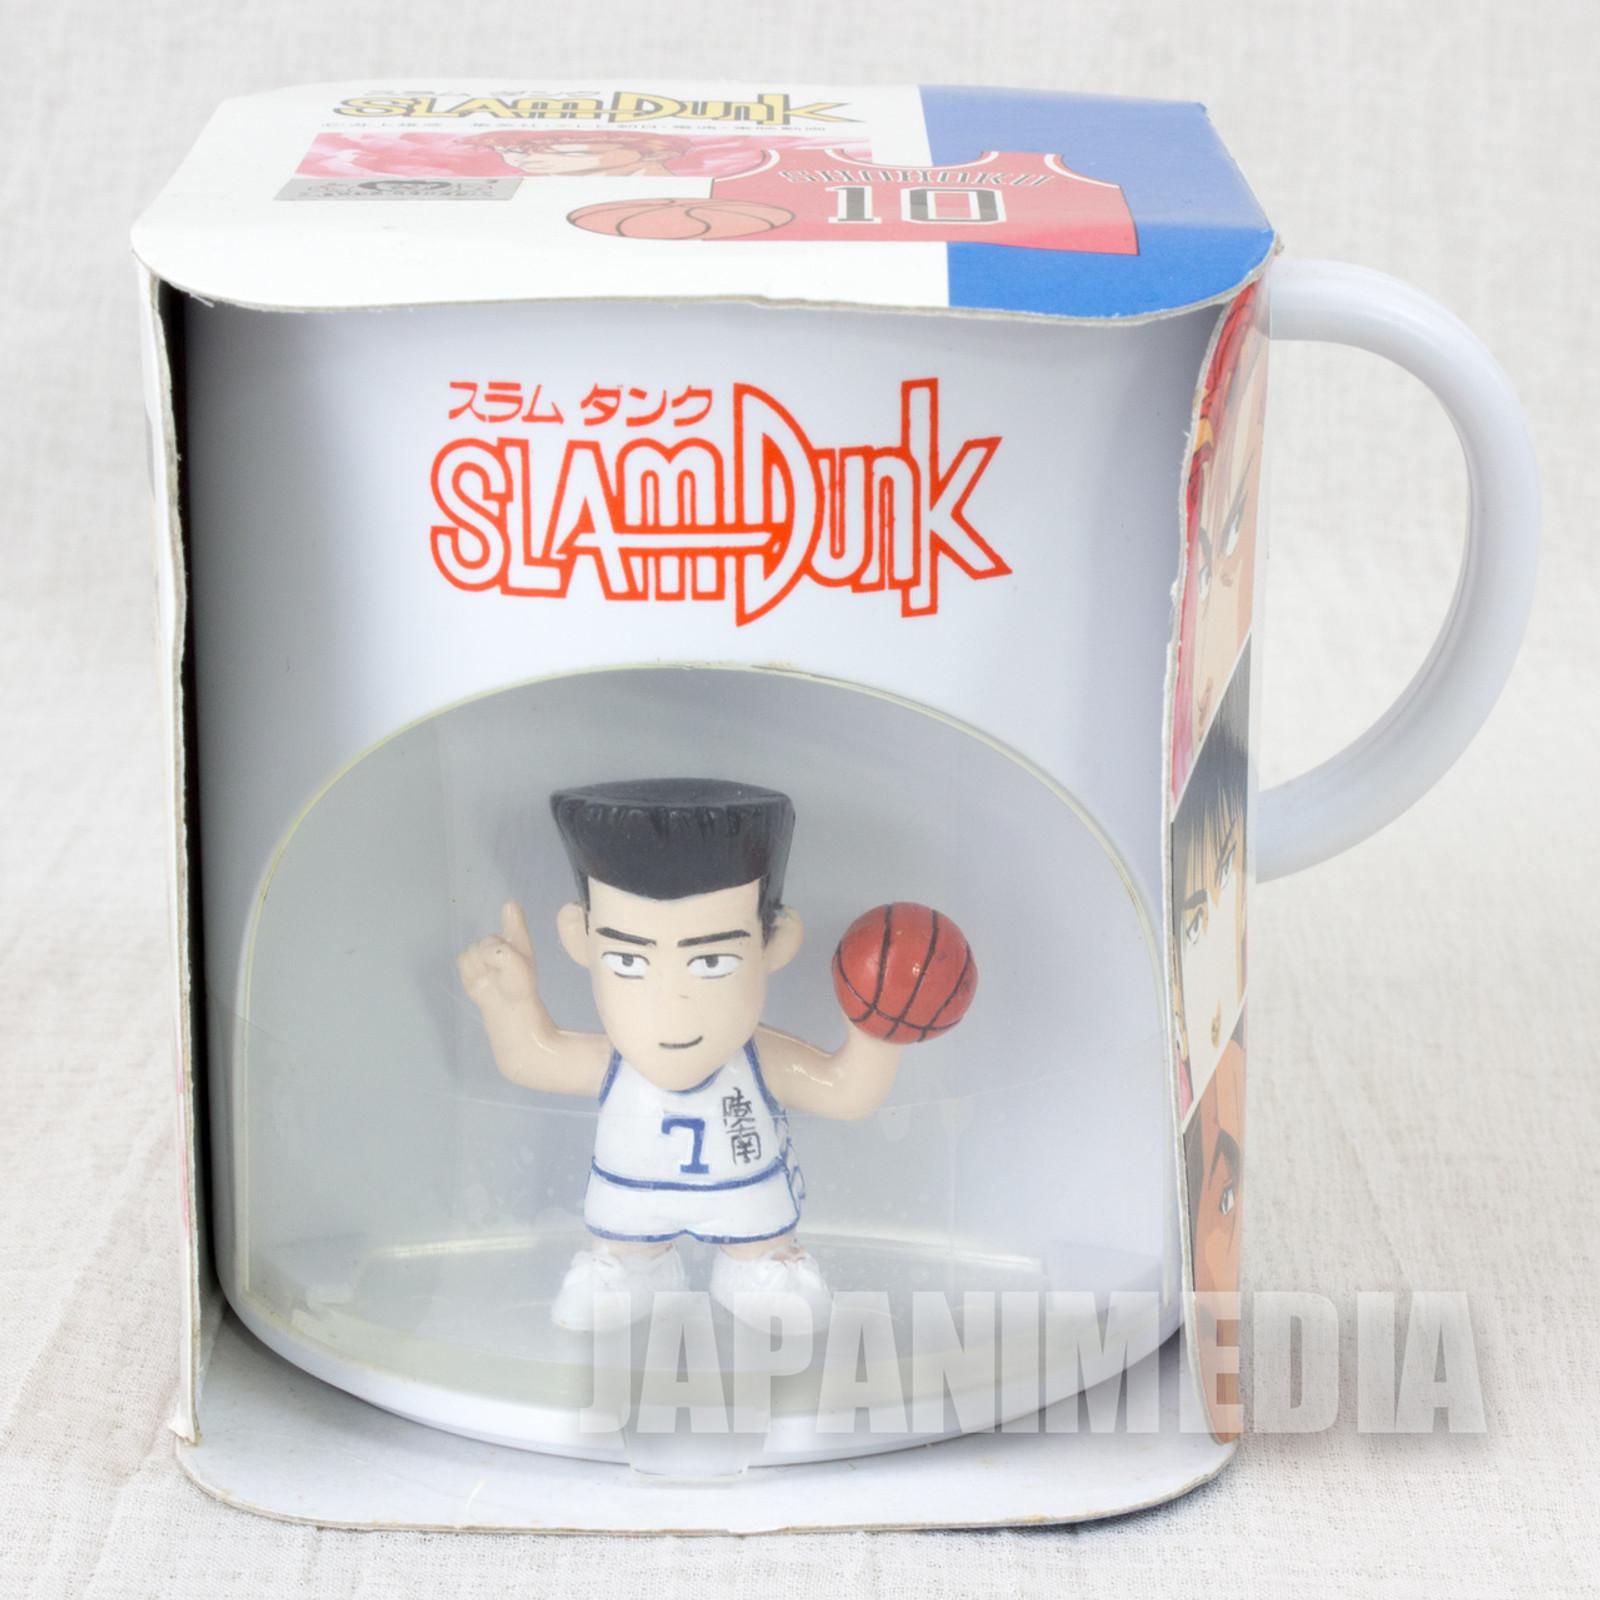 SLAM DUNK Akira Sendoh Team Ryonan #7 Figure in Plastic Mug Banpresto JAPAN ANIME MANGA